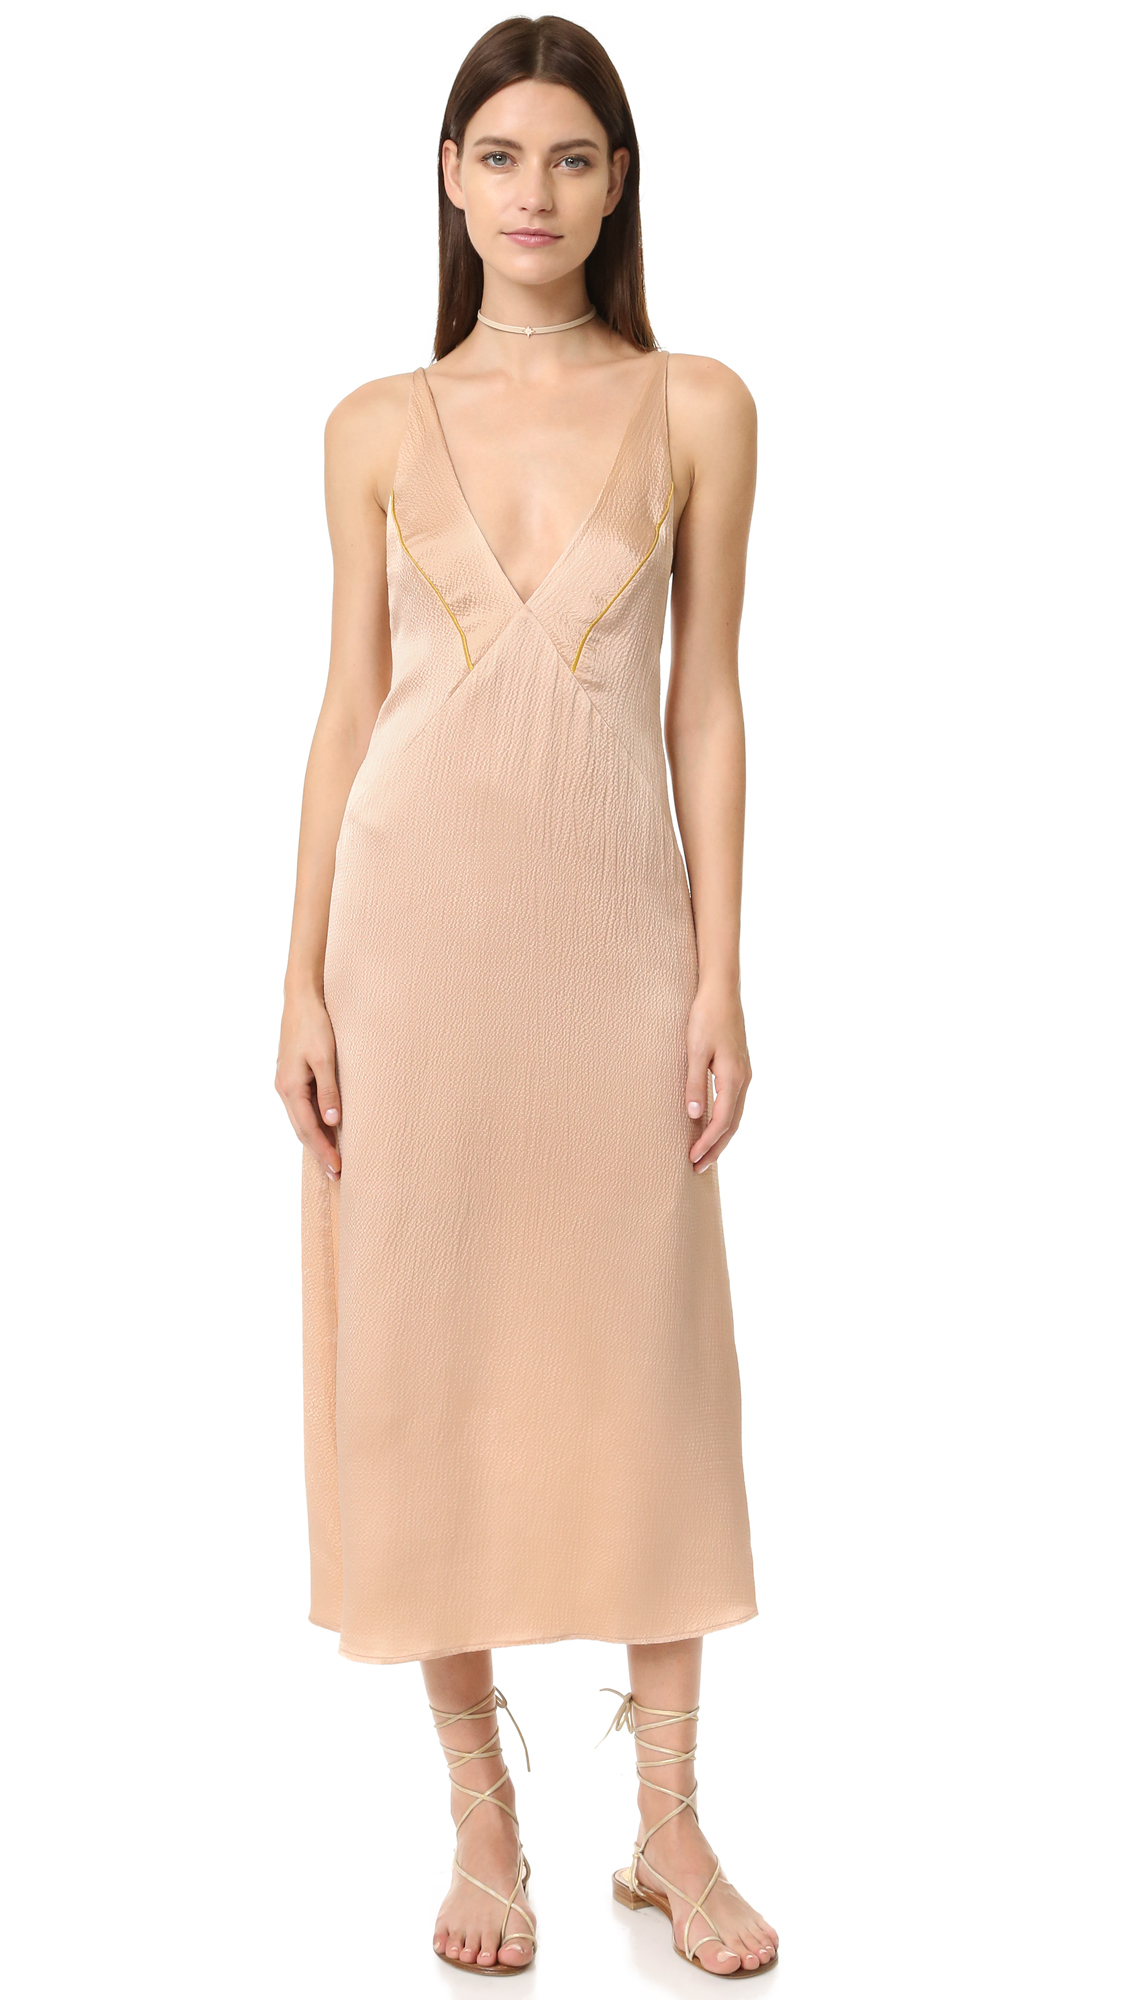 edf3825ea81 Dillards Spring Mother Of The Bride Dresses